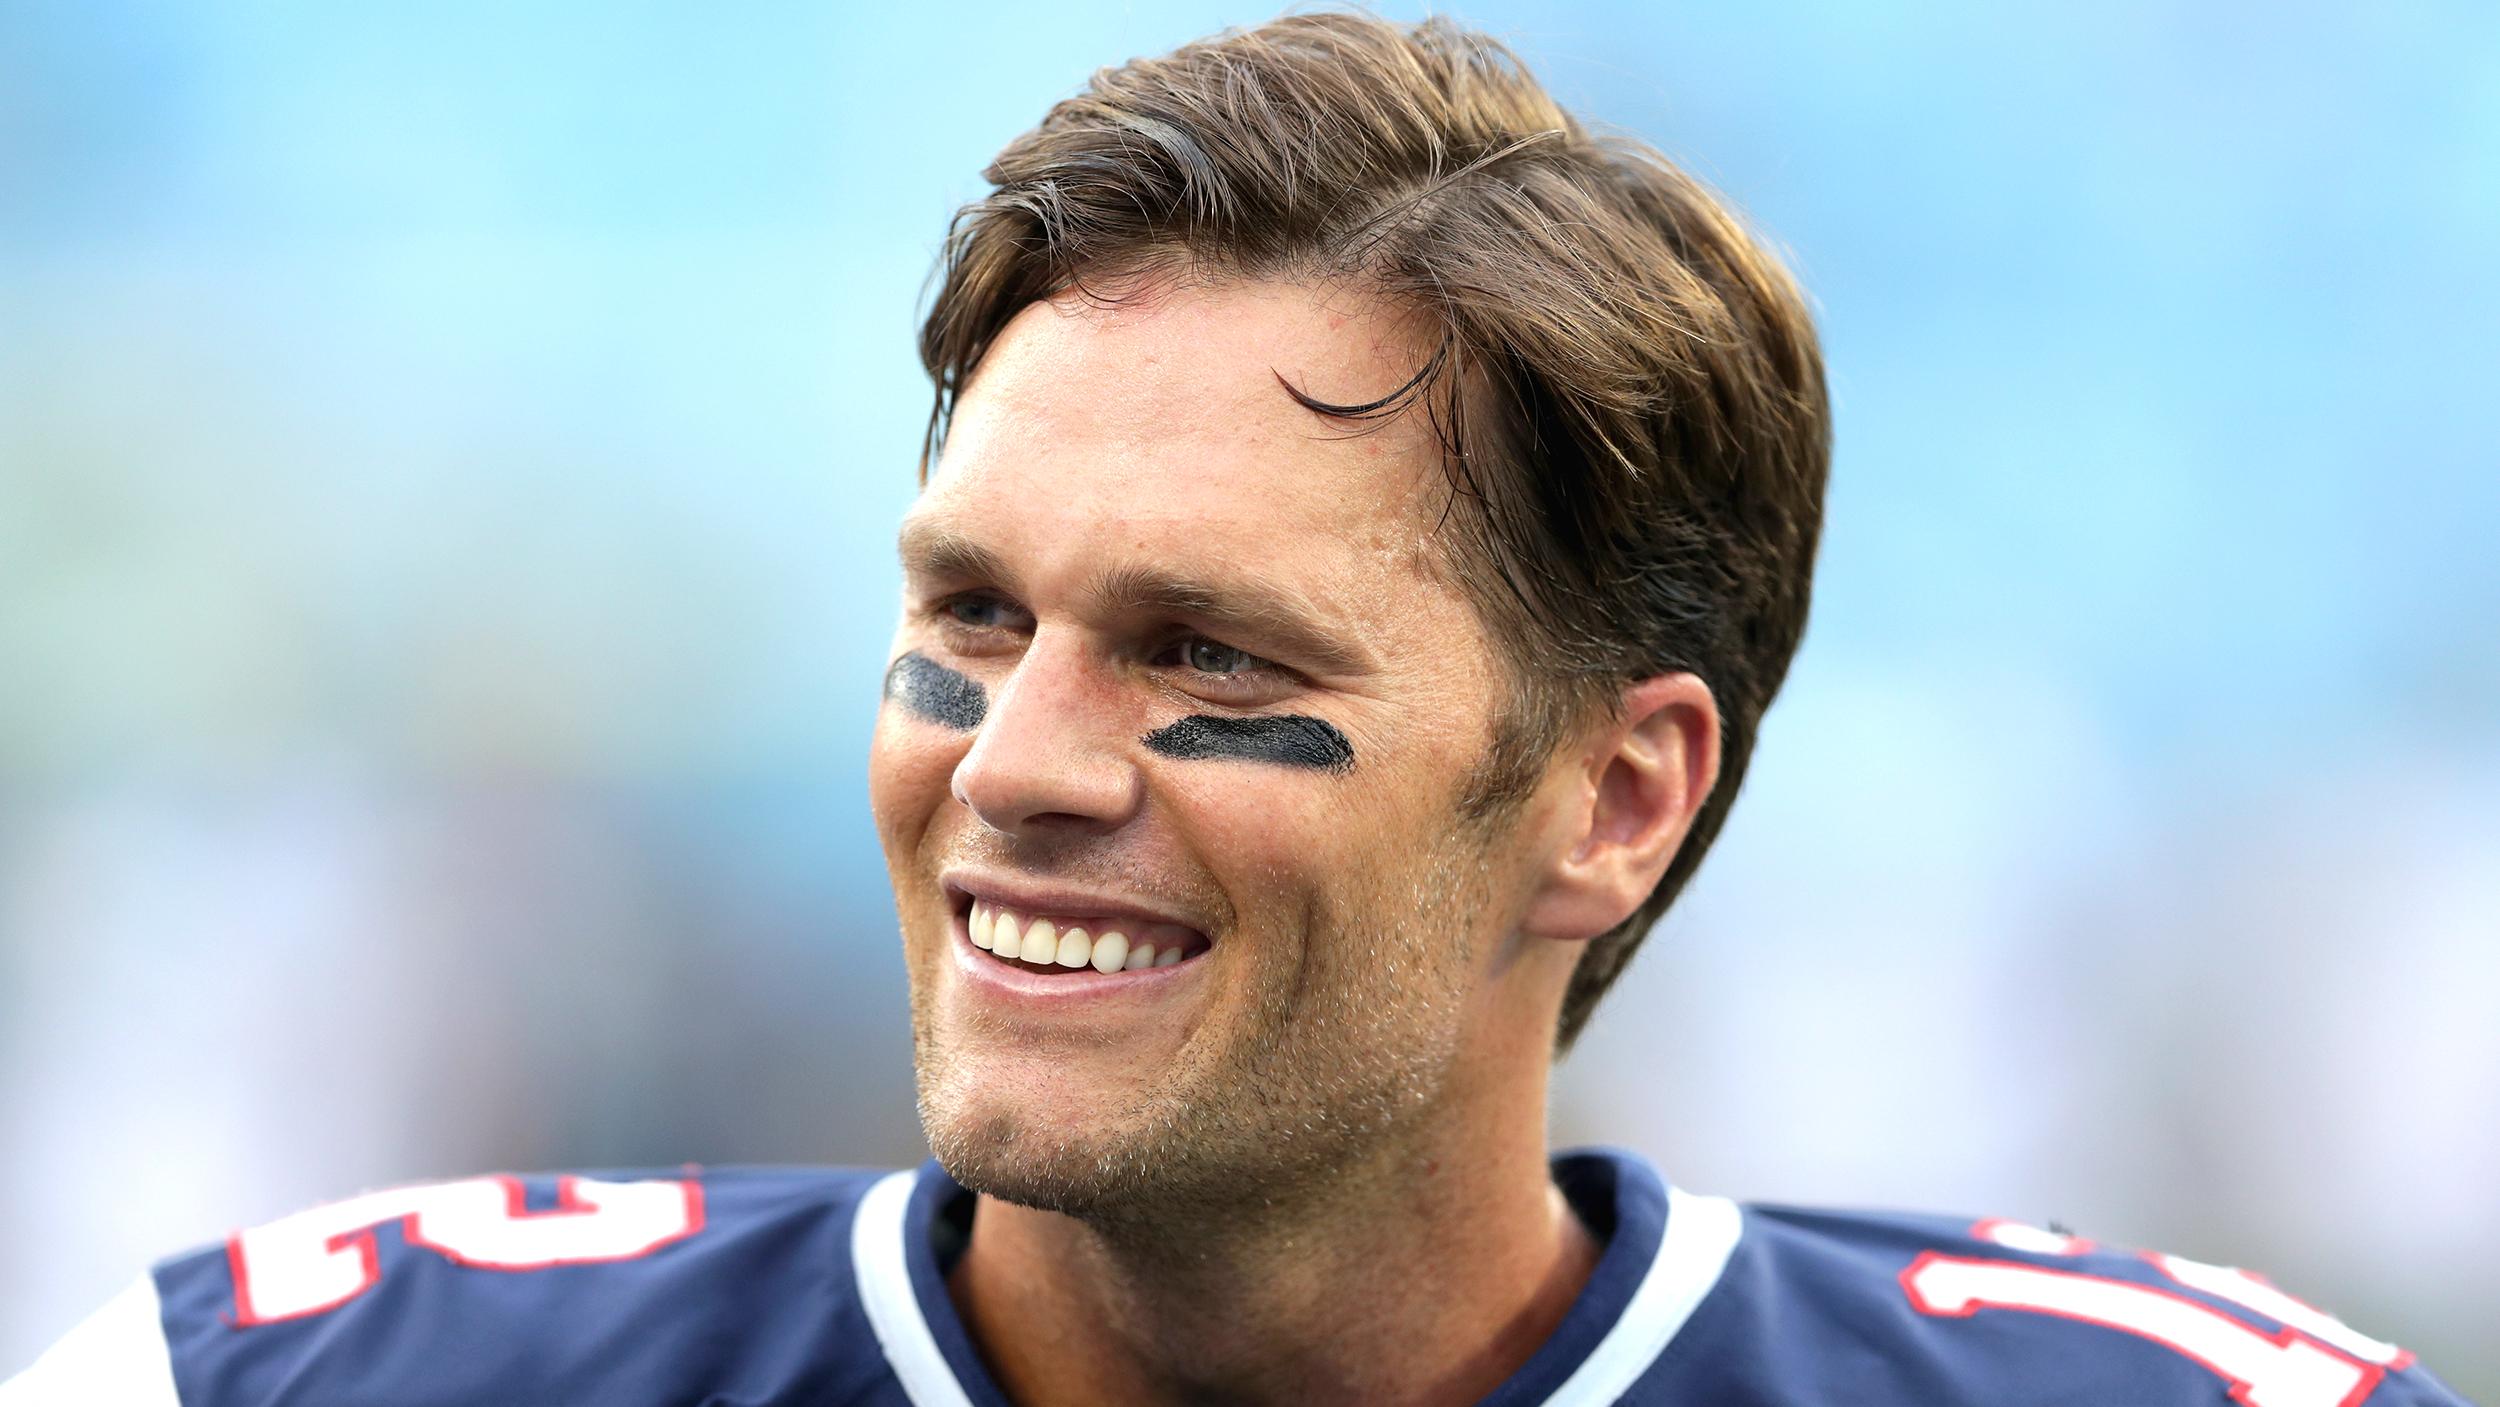 Tom Brady Hair Style by stevesalt.us